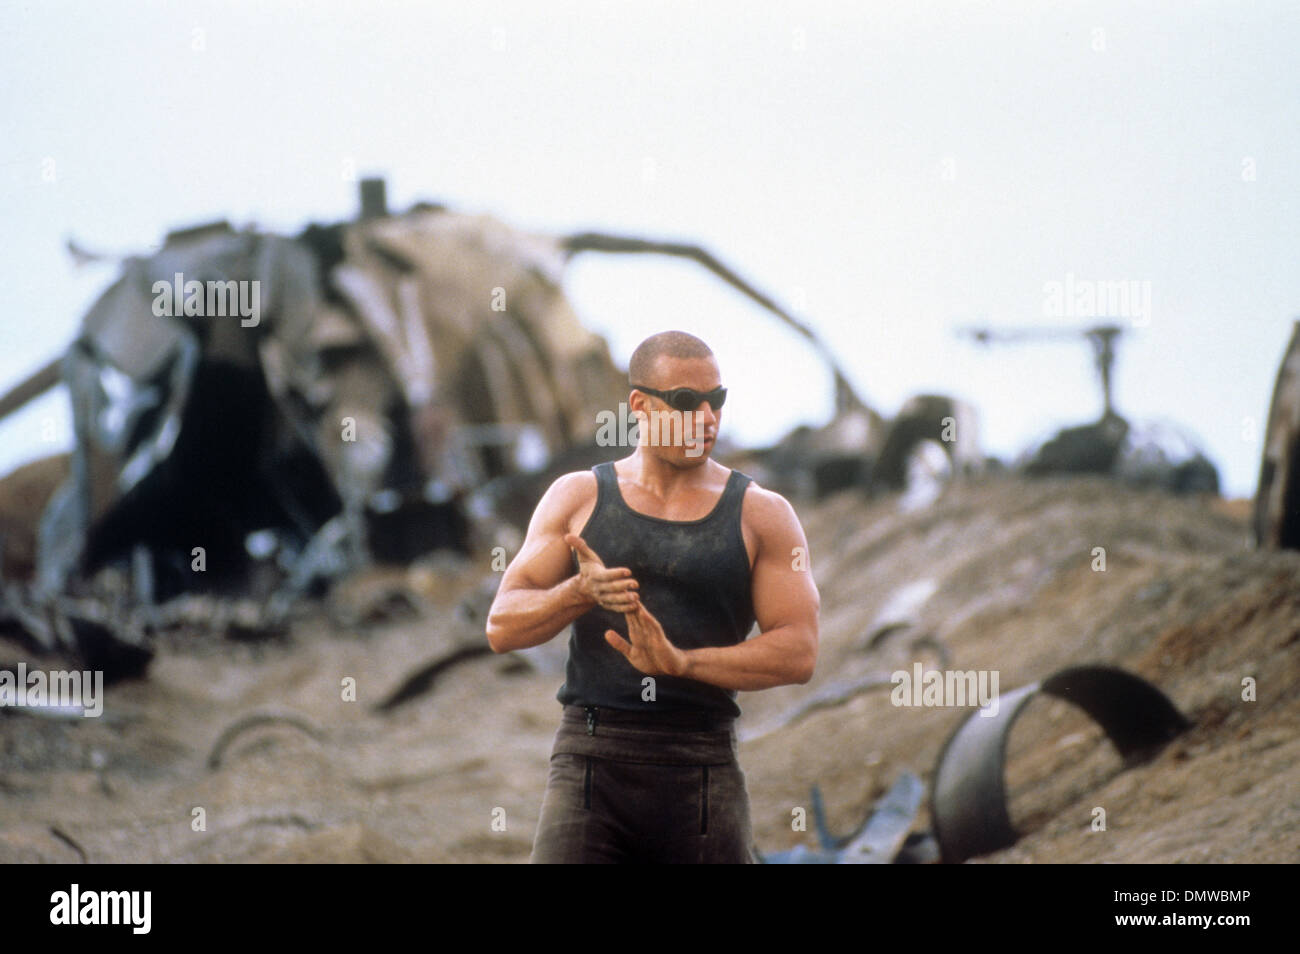 PITCH BLACK  2000 Polygram film with Vin Diesel - Stock Image